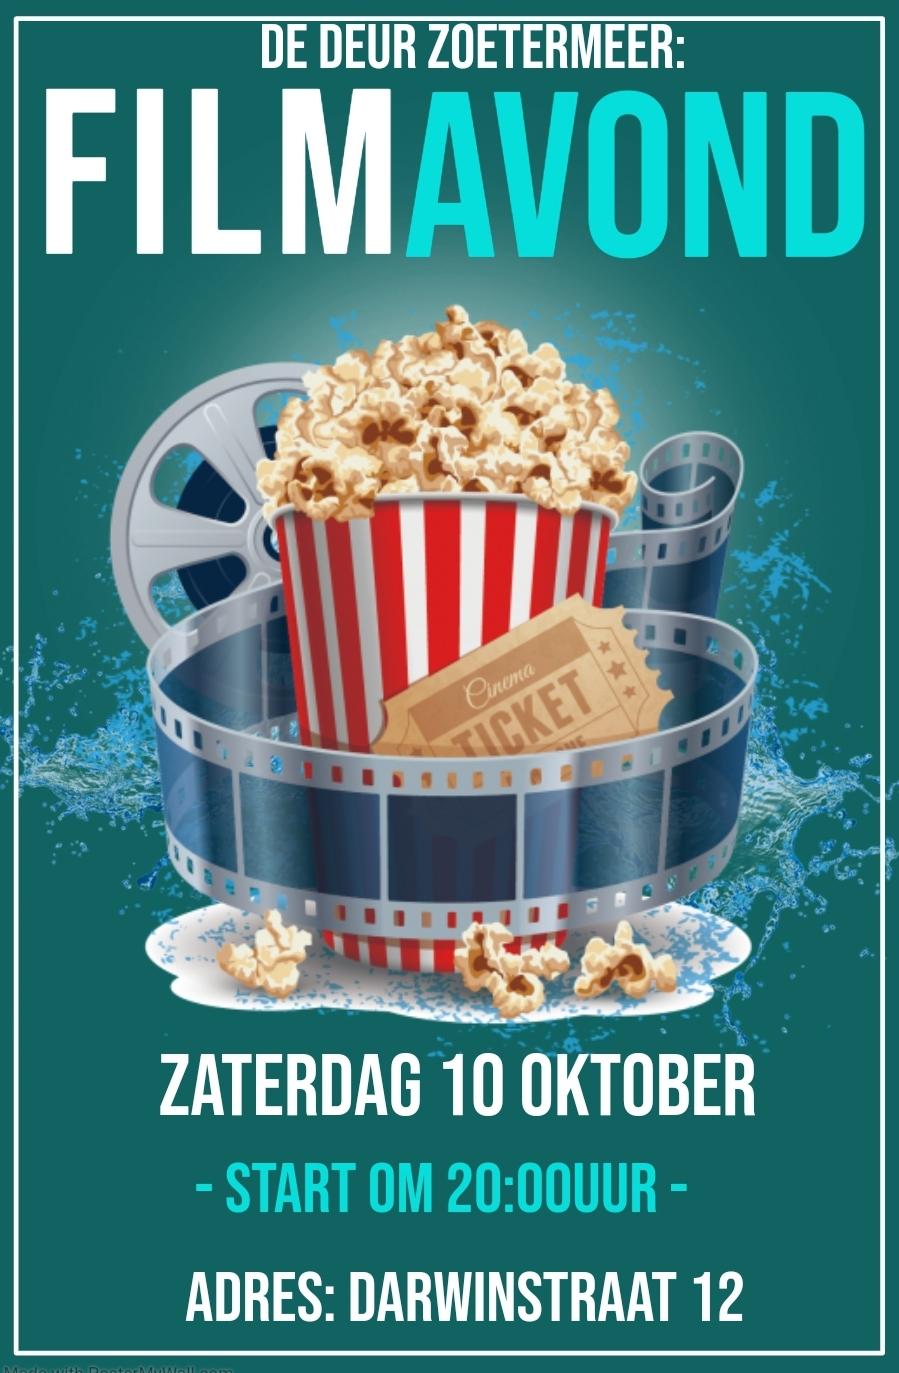 Filmavond 10 oktober